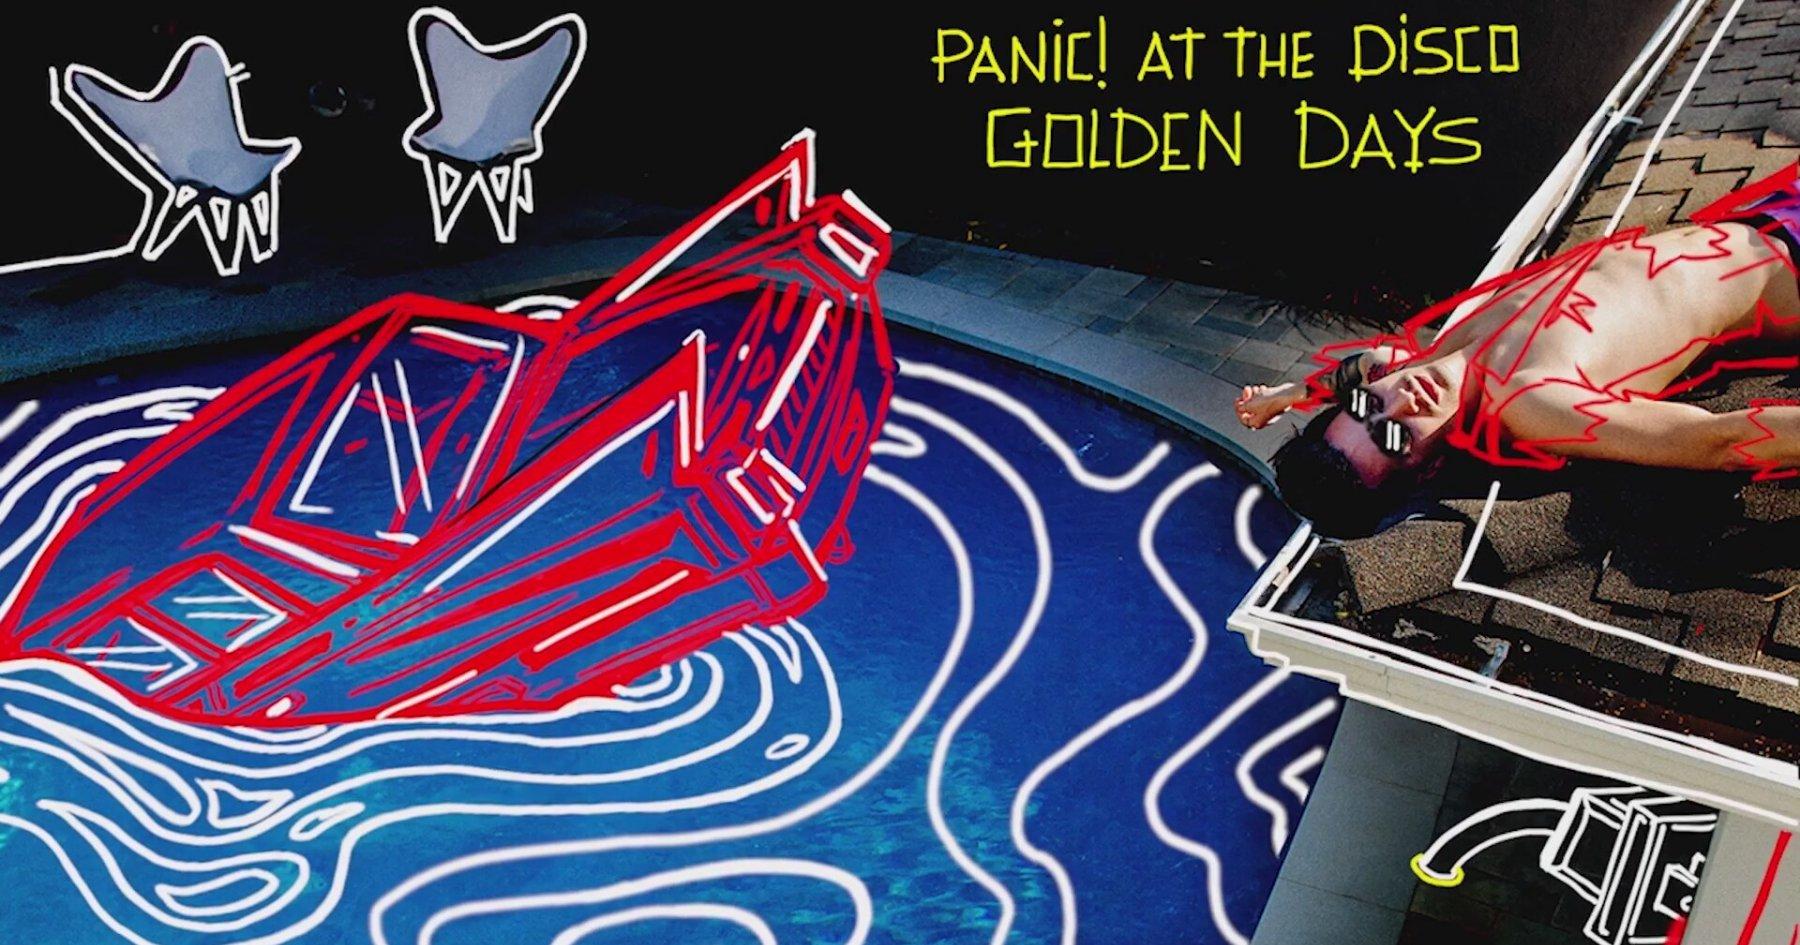 Panic at the Disco - Golden Days Dinle | İzlesene.com